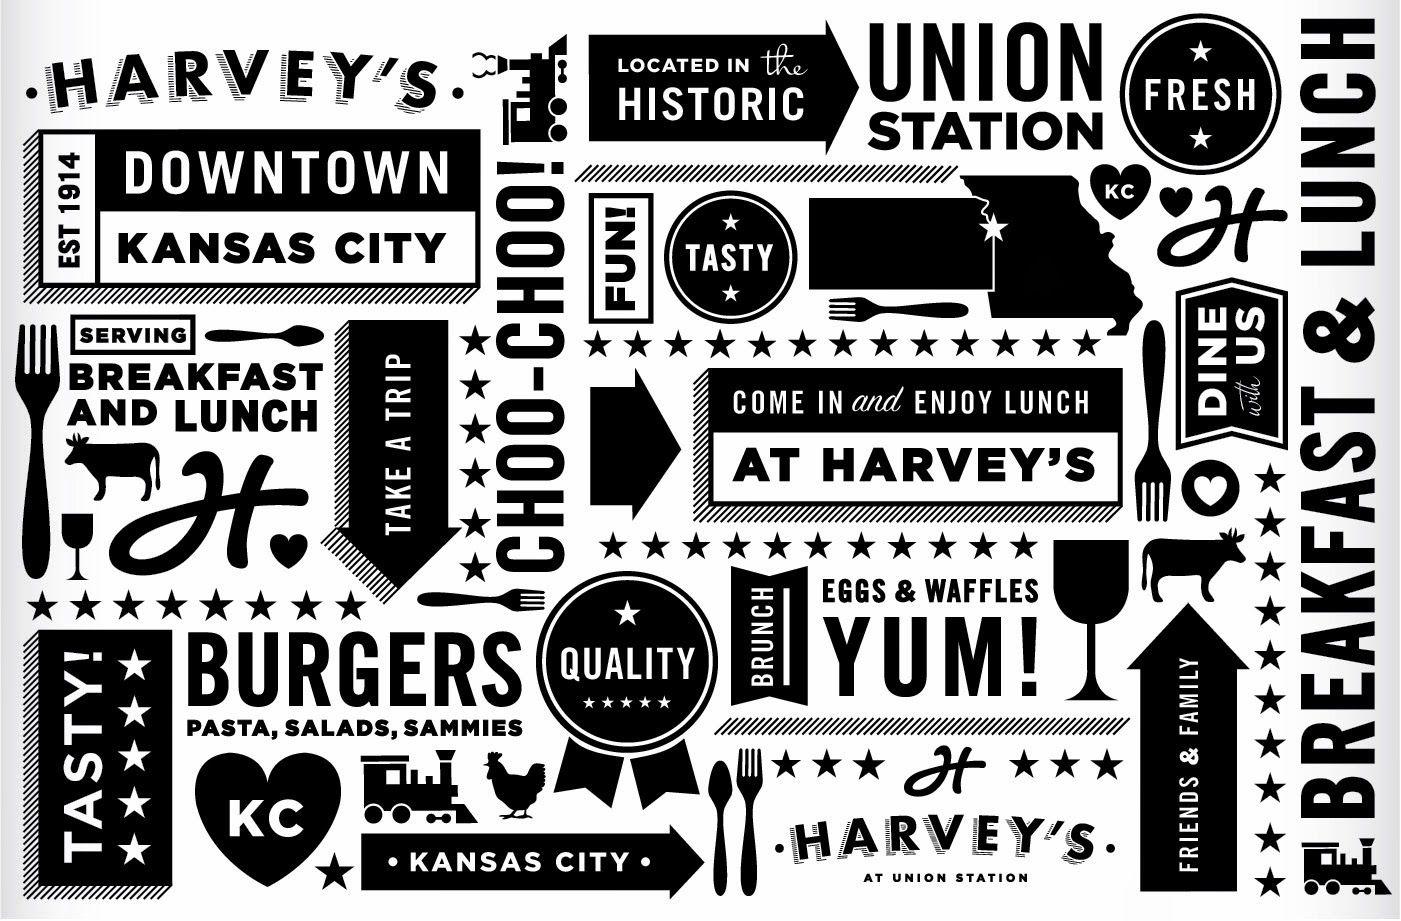 Project Love: Harvey's